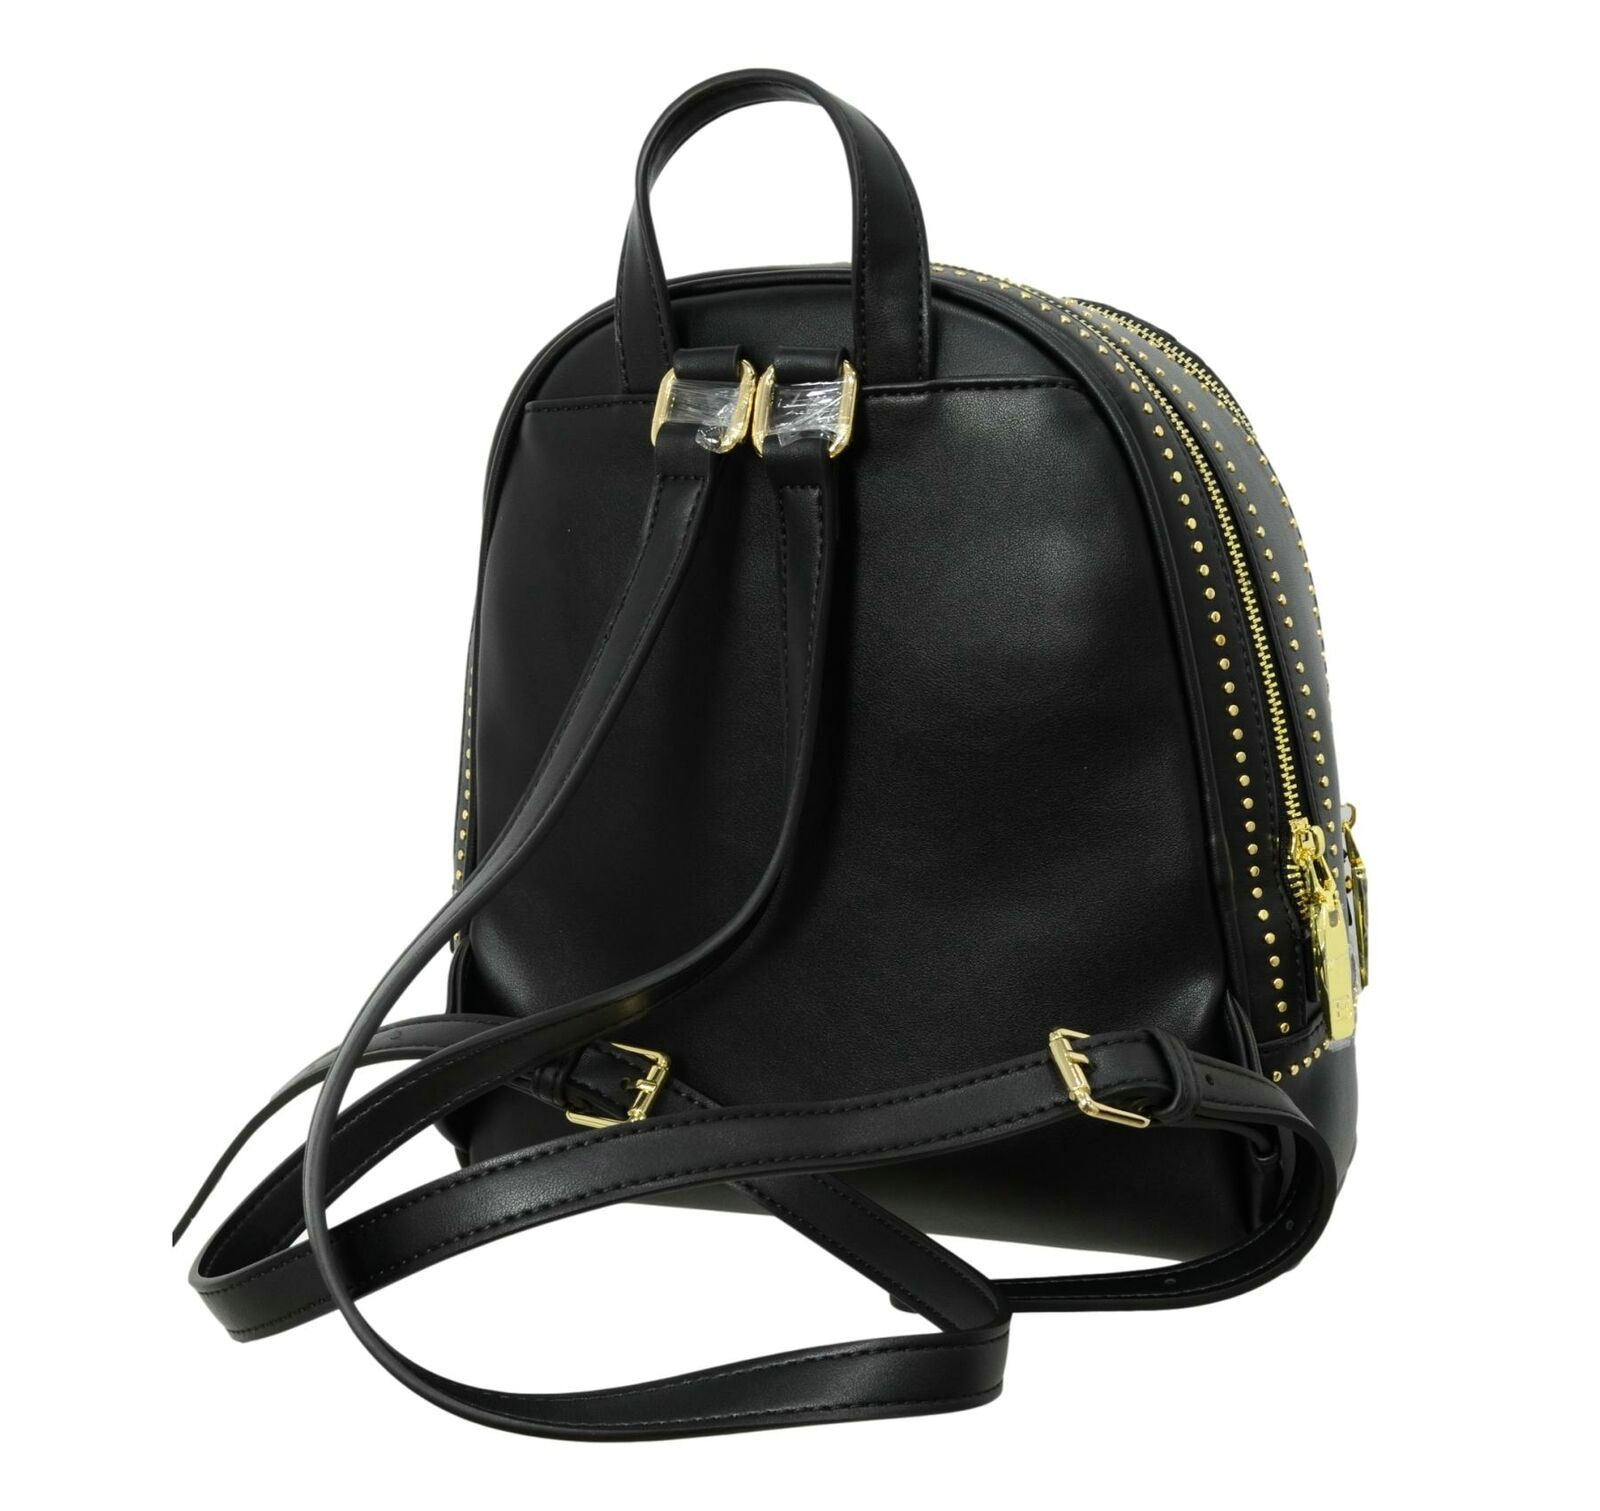 Zaino Ermanno Scervino Backpack Juliet 12401179 Nero retro